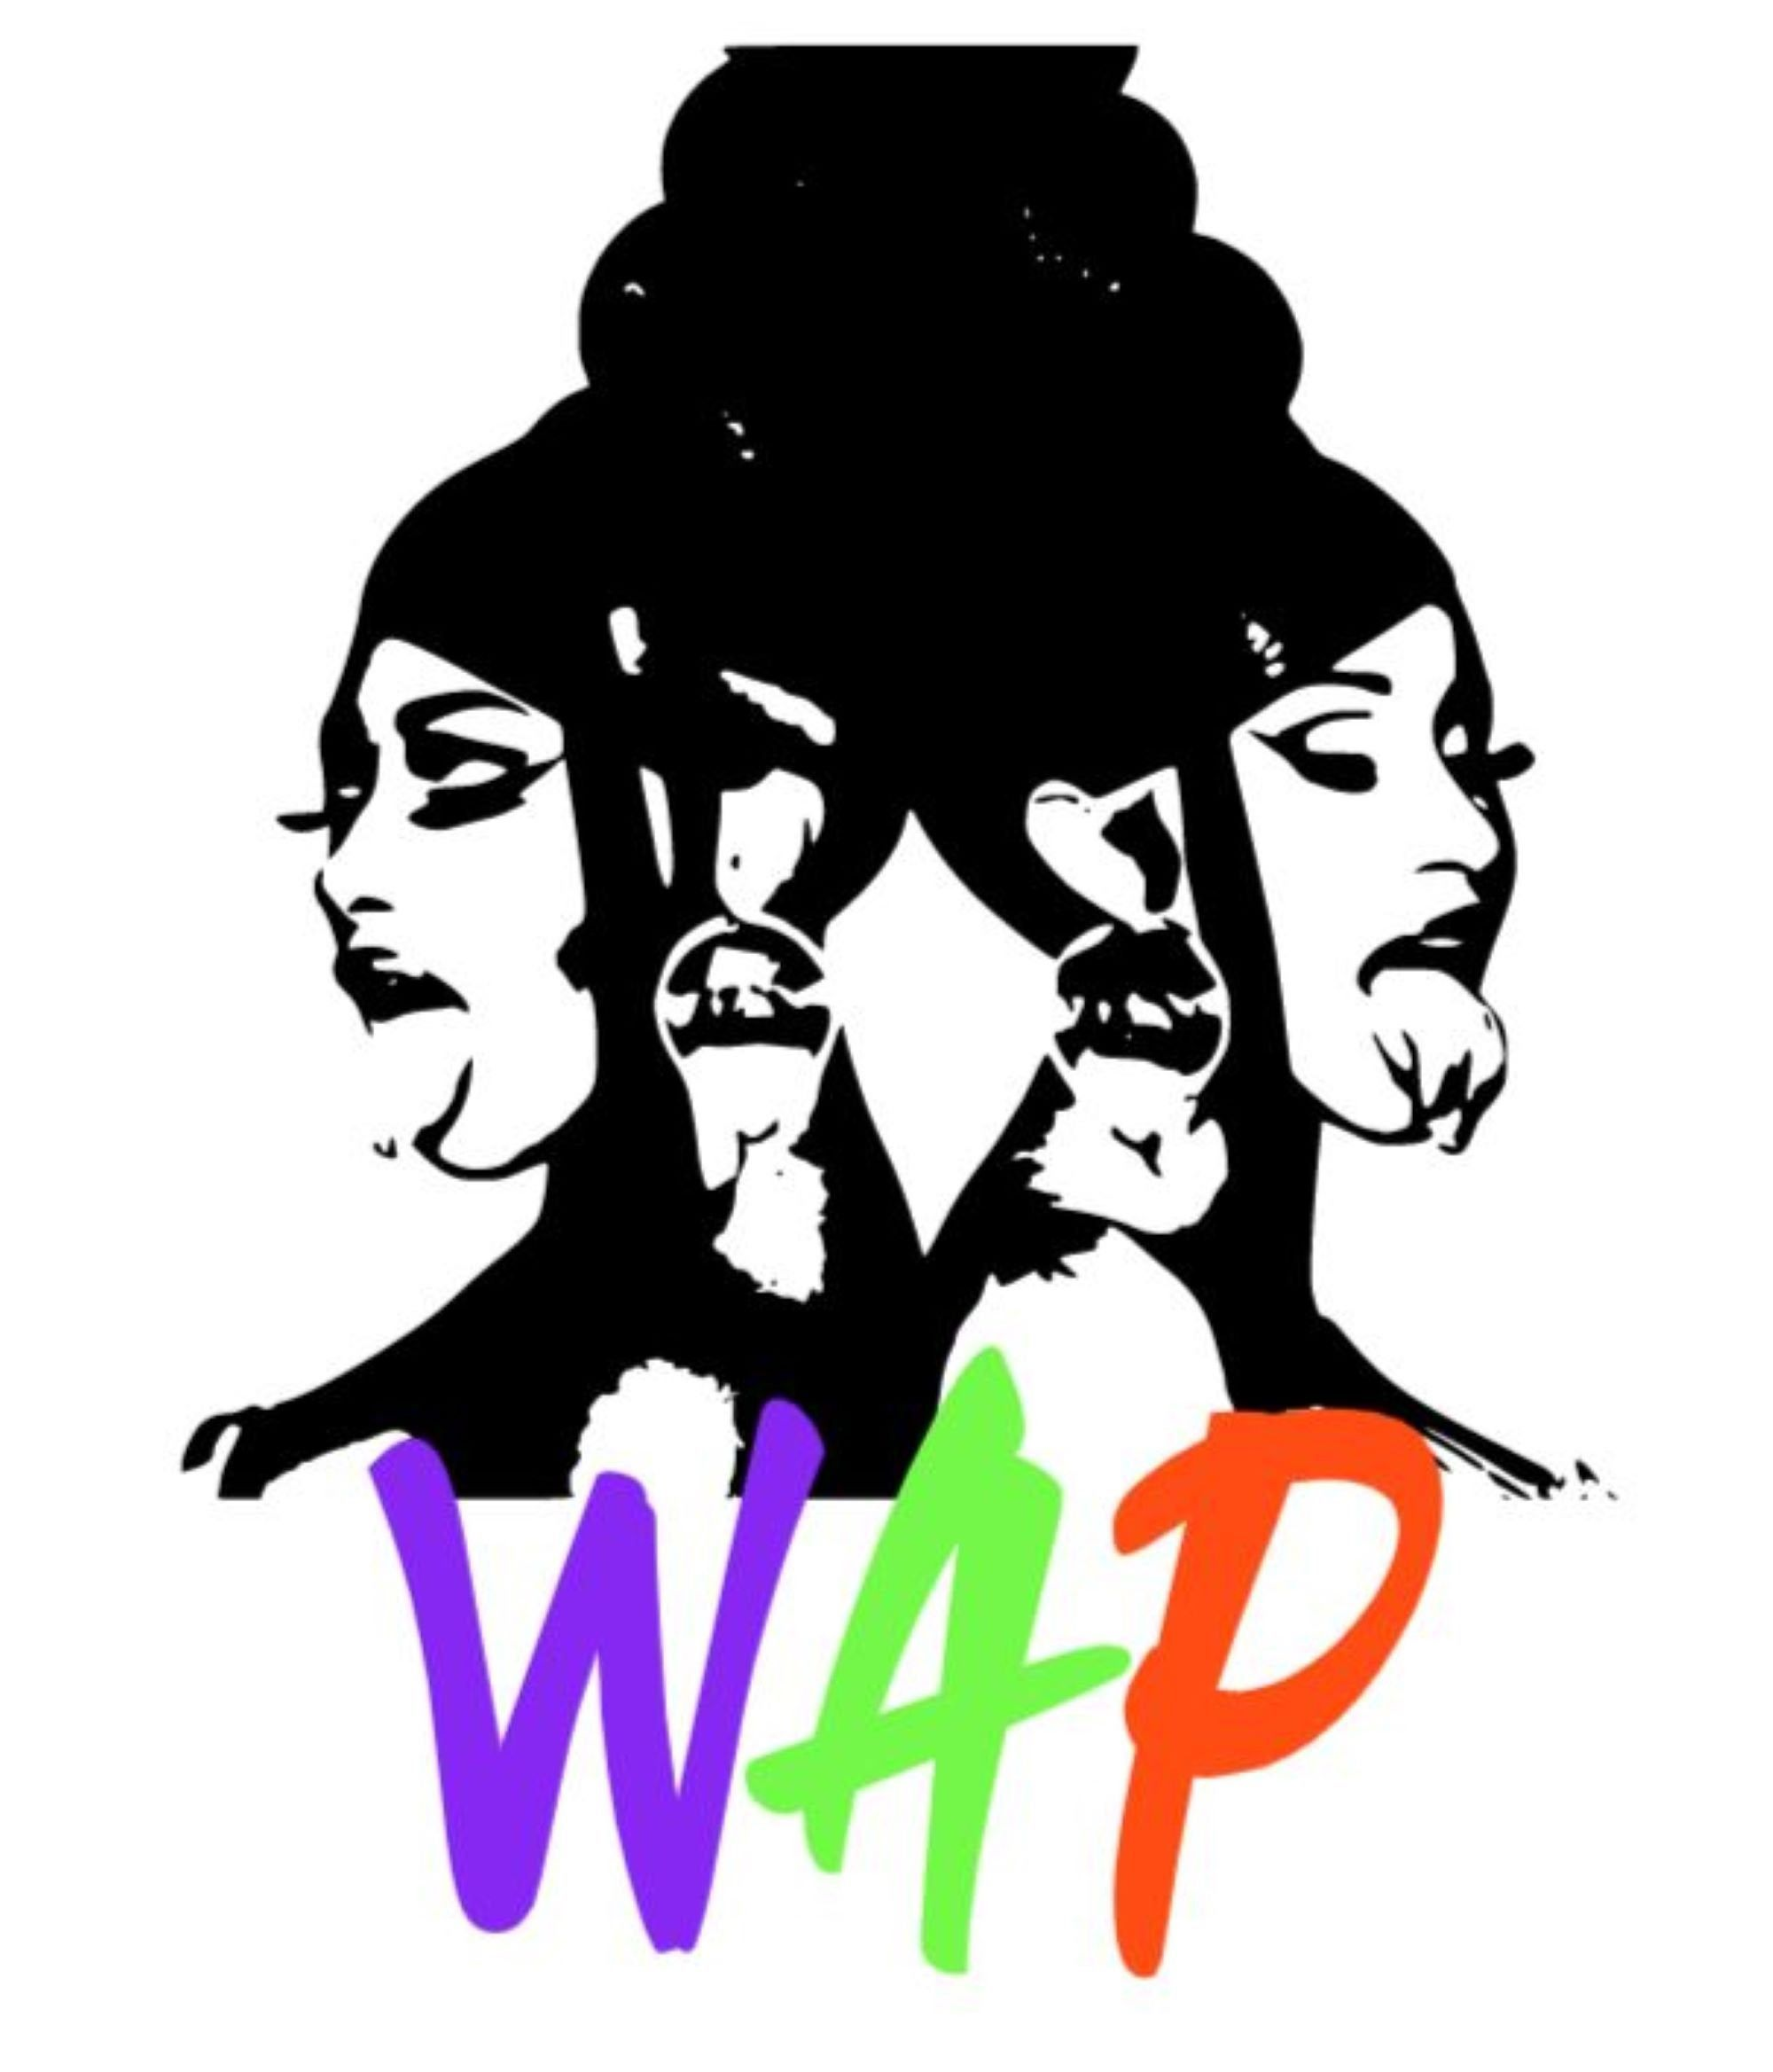 Cardi B And Megan The Stallion Wap Svg Rap Svg Popular Svg Etsy In 2021 Instagram Cartoon Cardi B Cricut Projects Vinyl